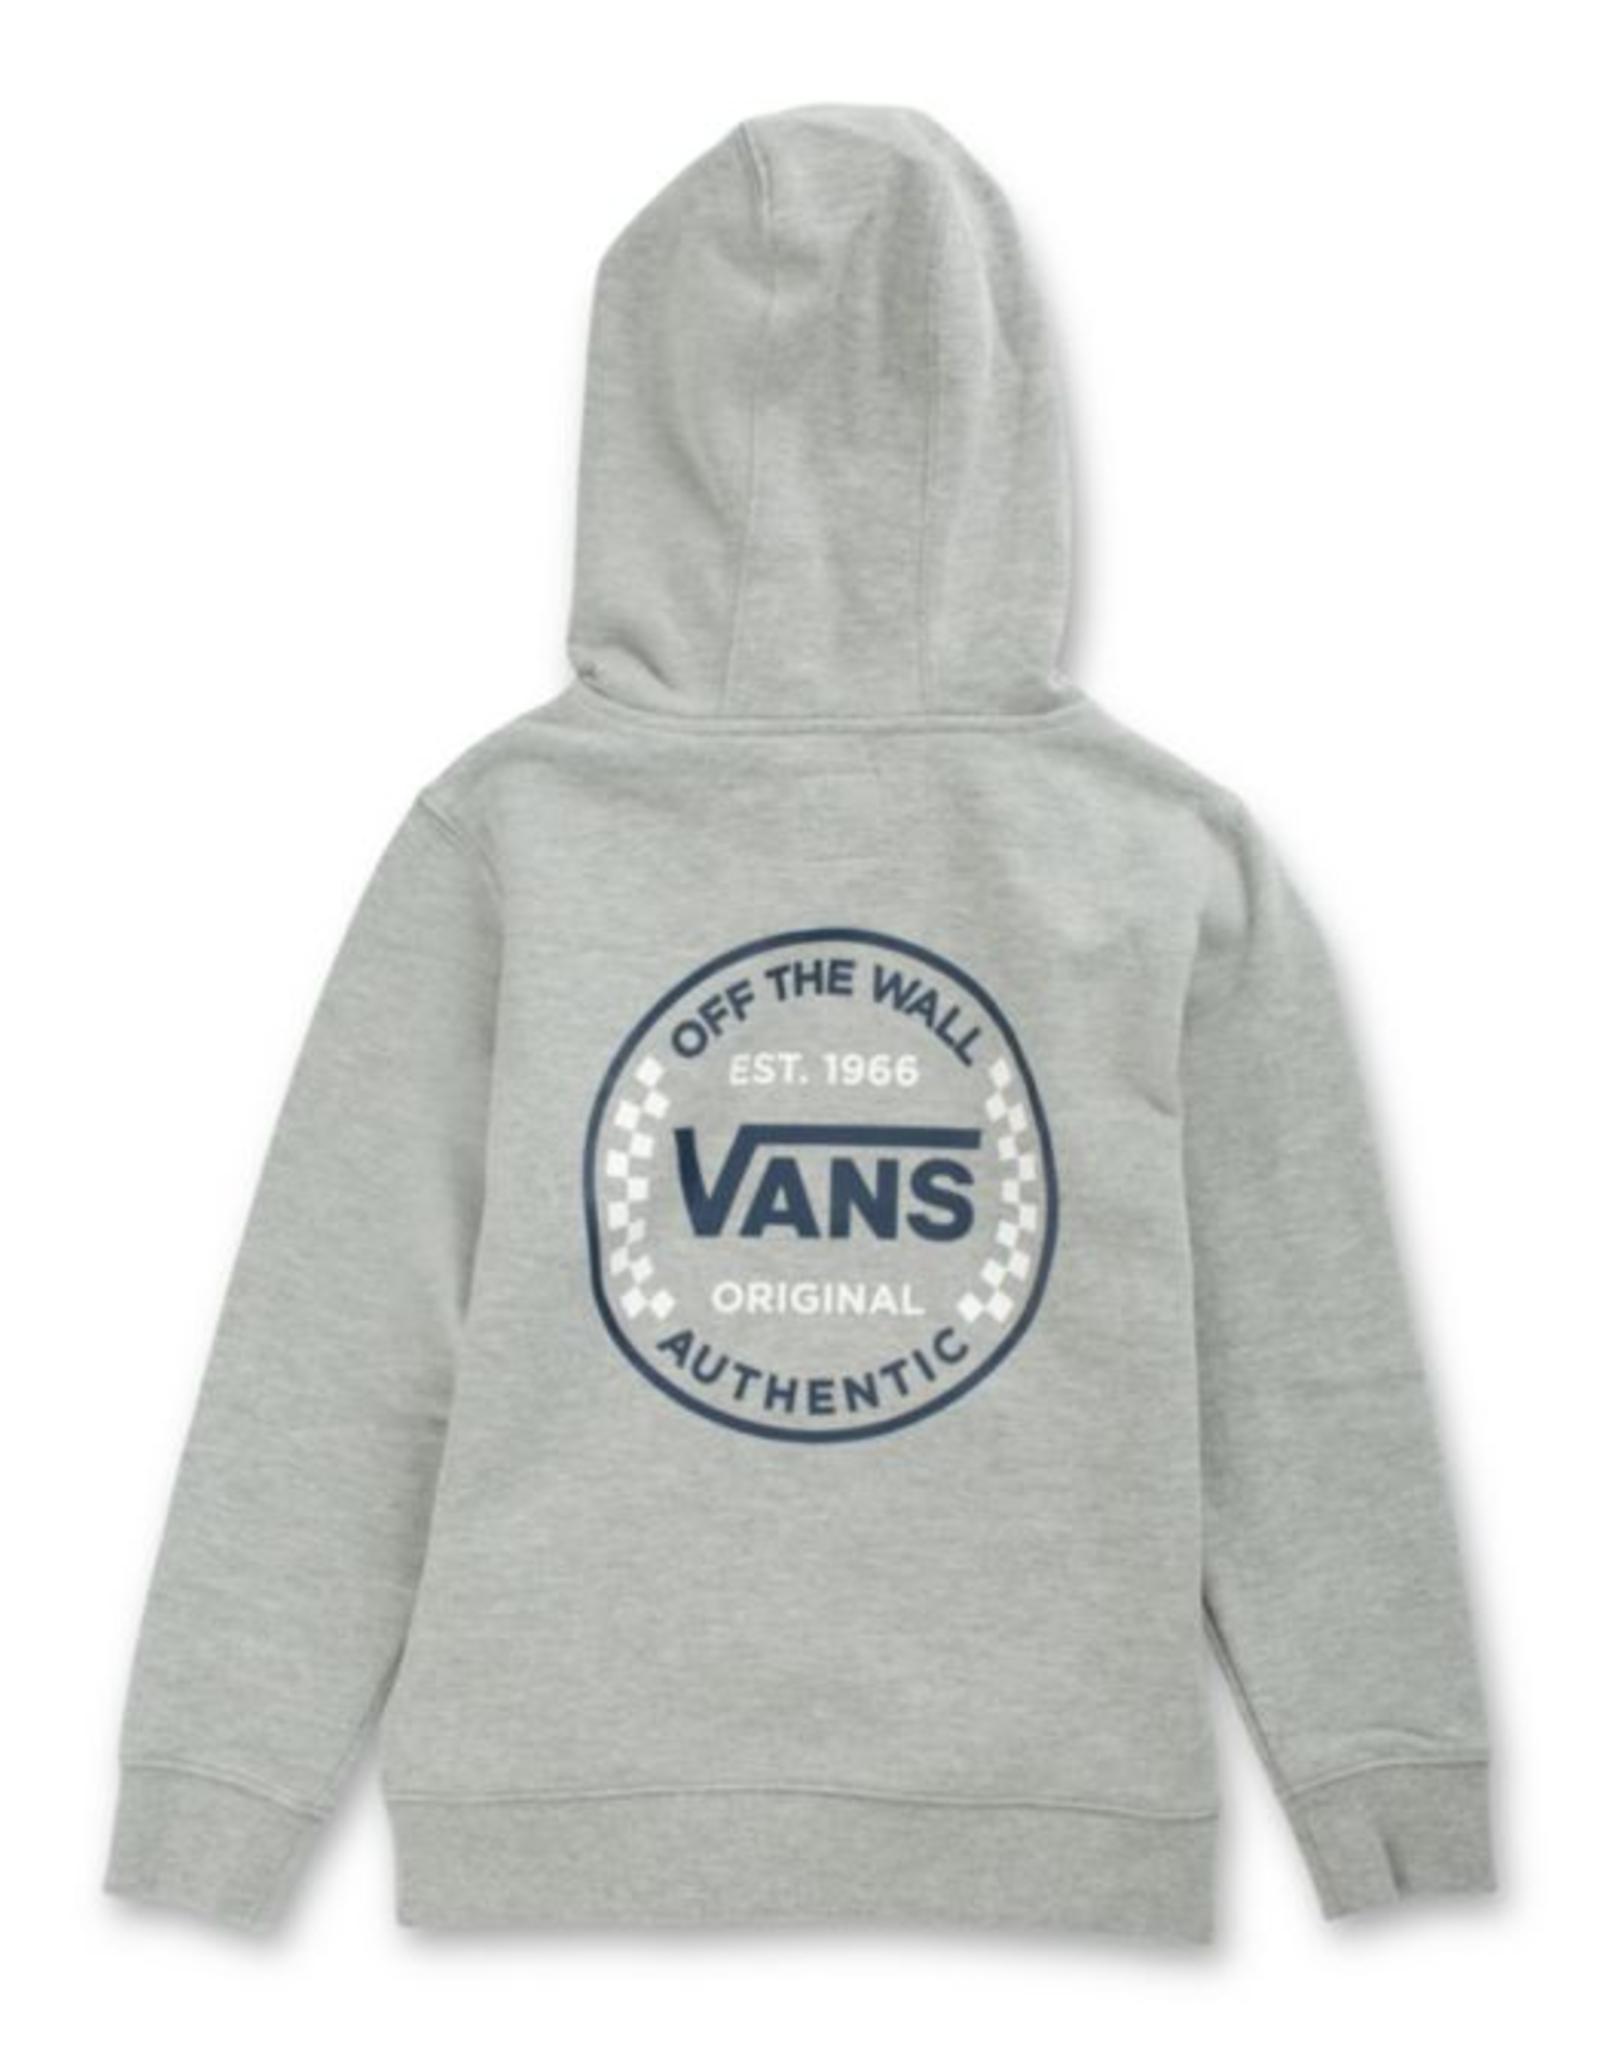 Vans SP21 Authentic Check Grey Hoodie